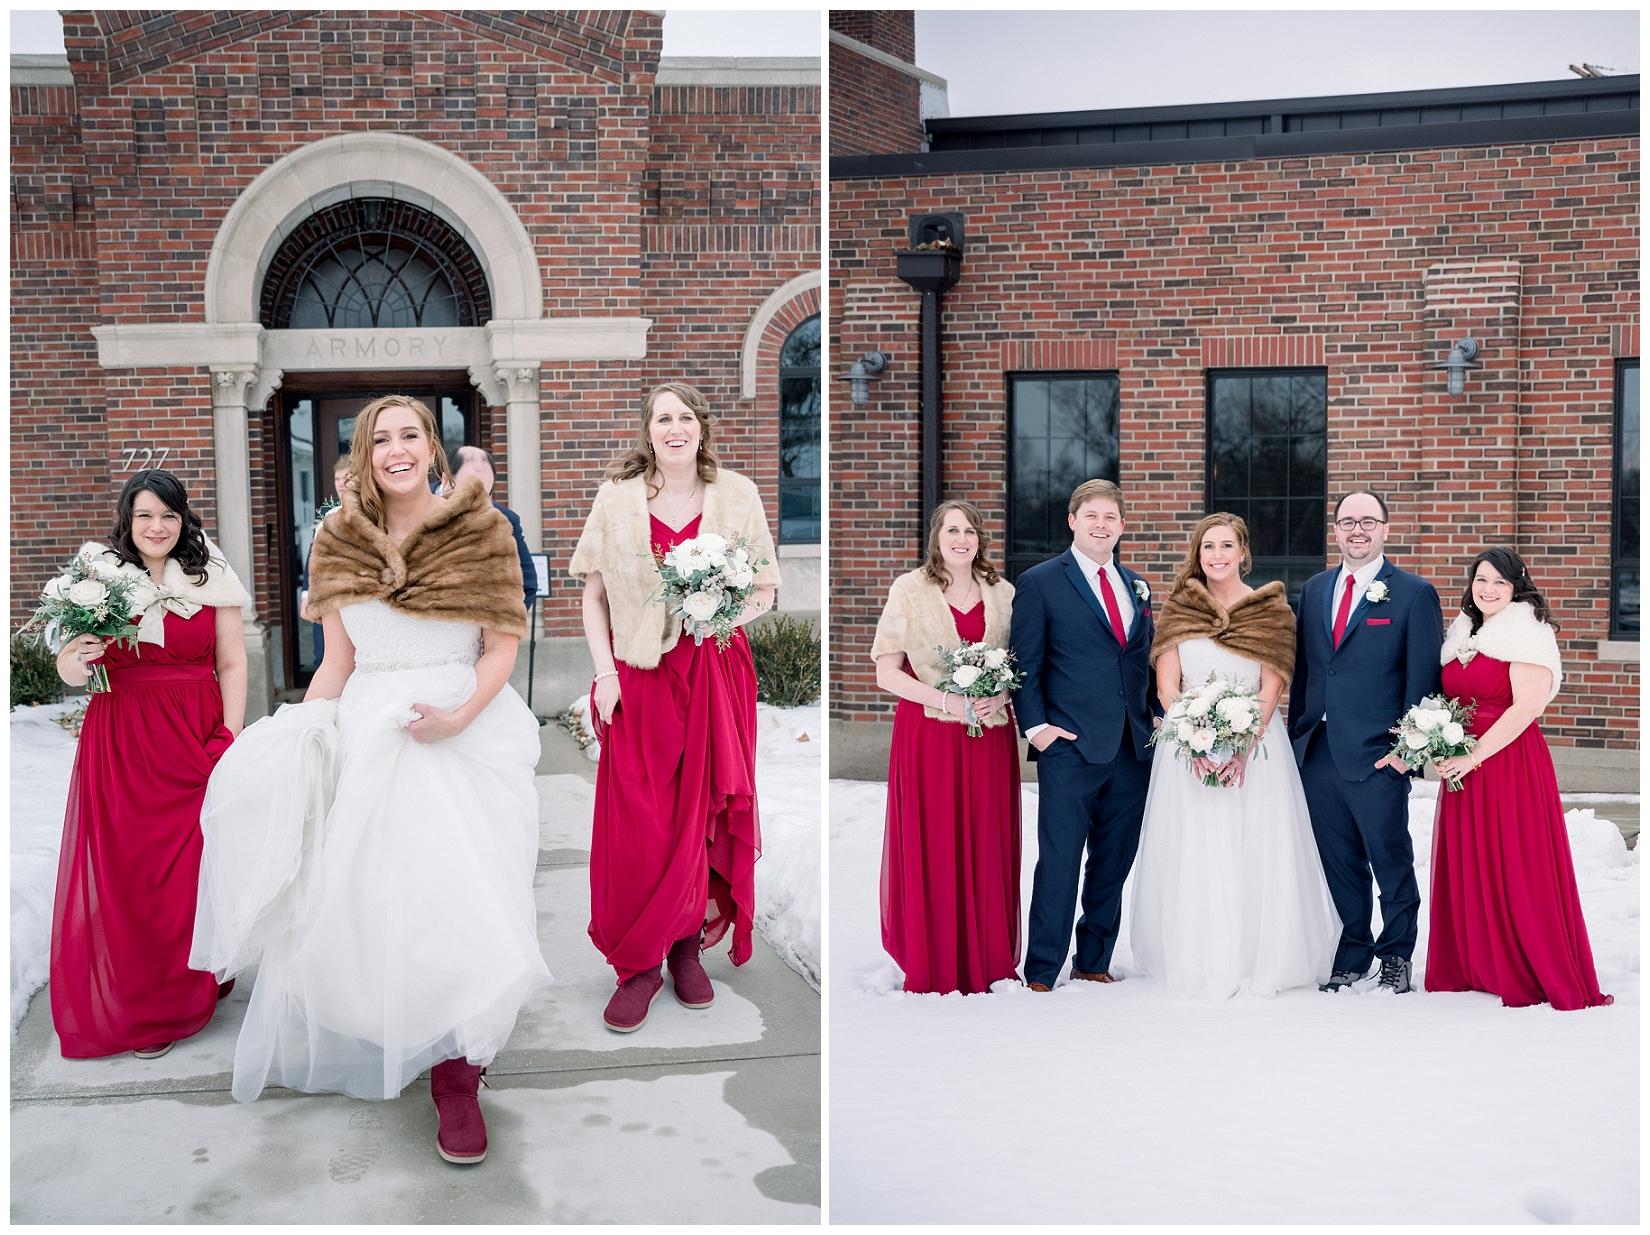 cat-alkire-wedding-photographer-indiana-chicago-indianapolis-fort-wayne_0953.jpg